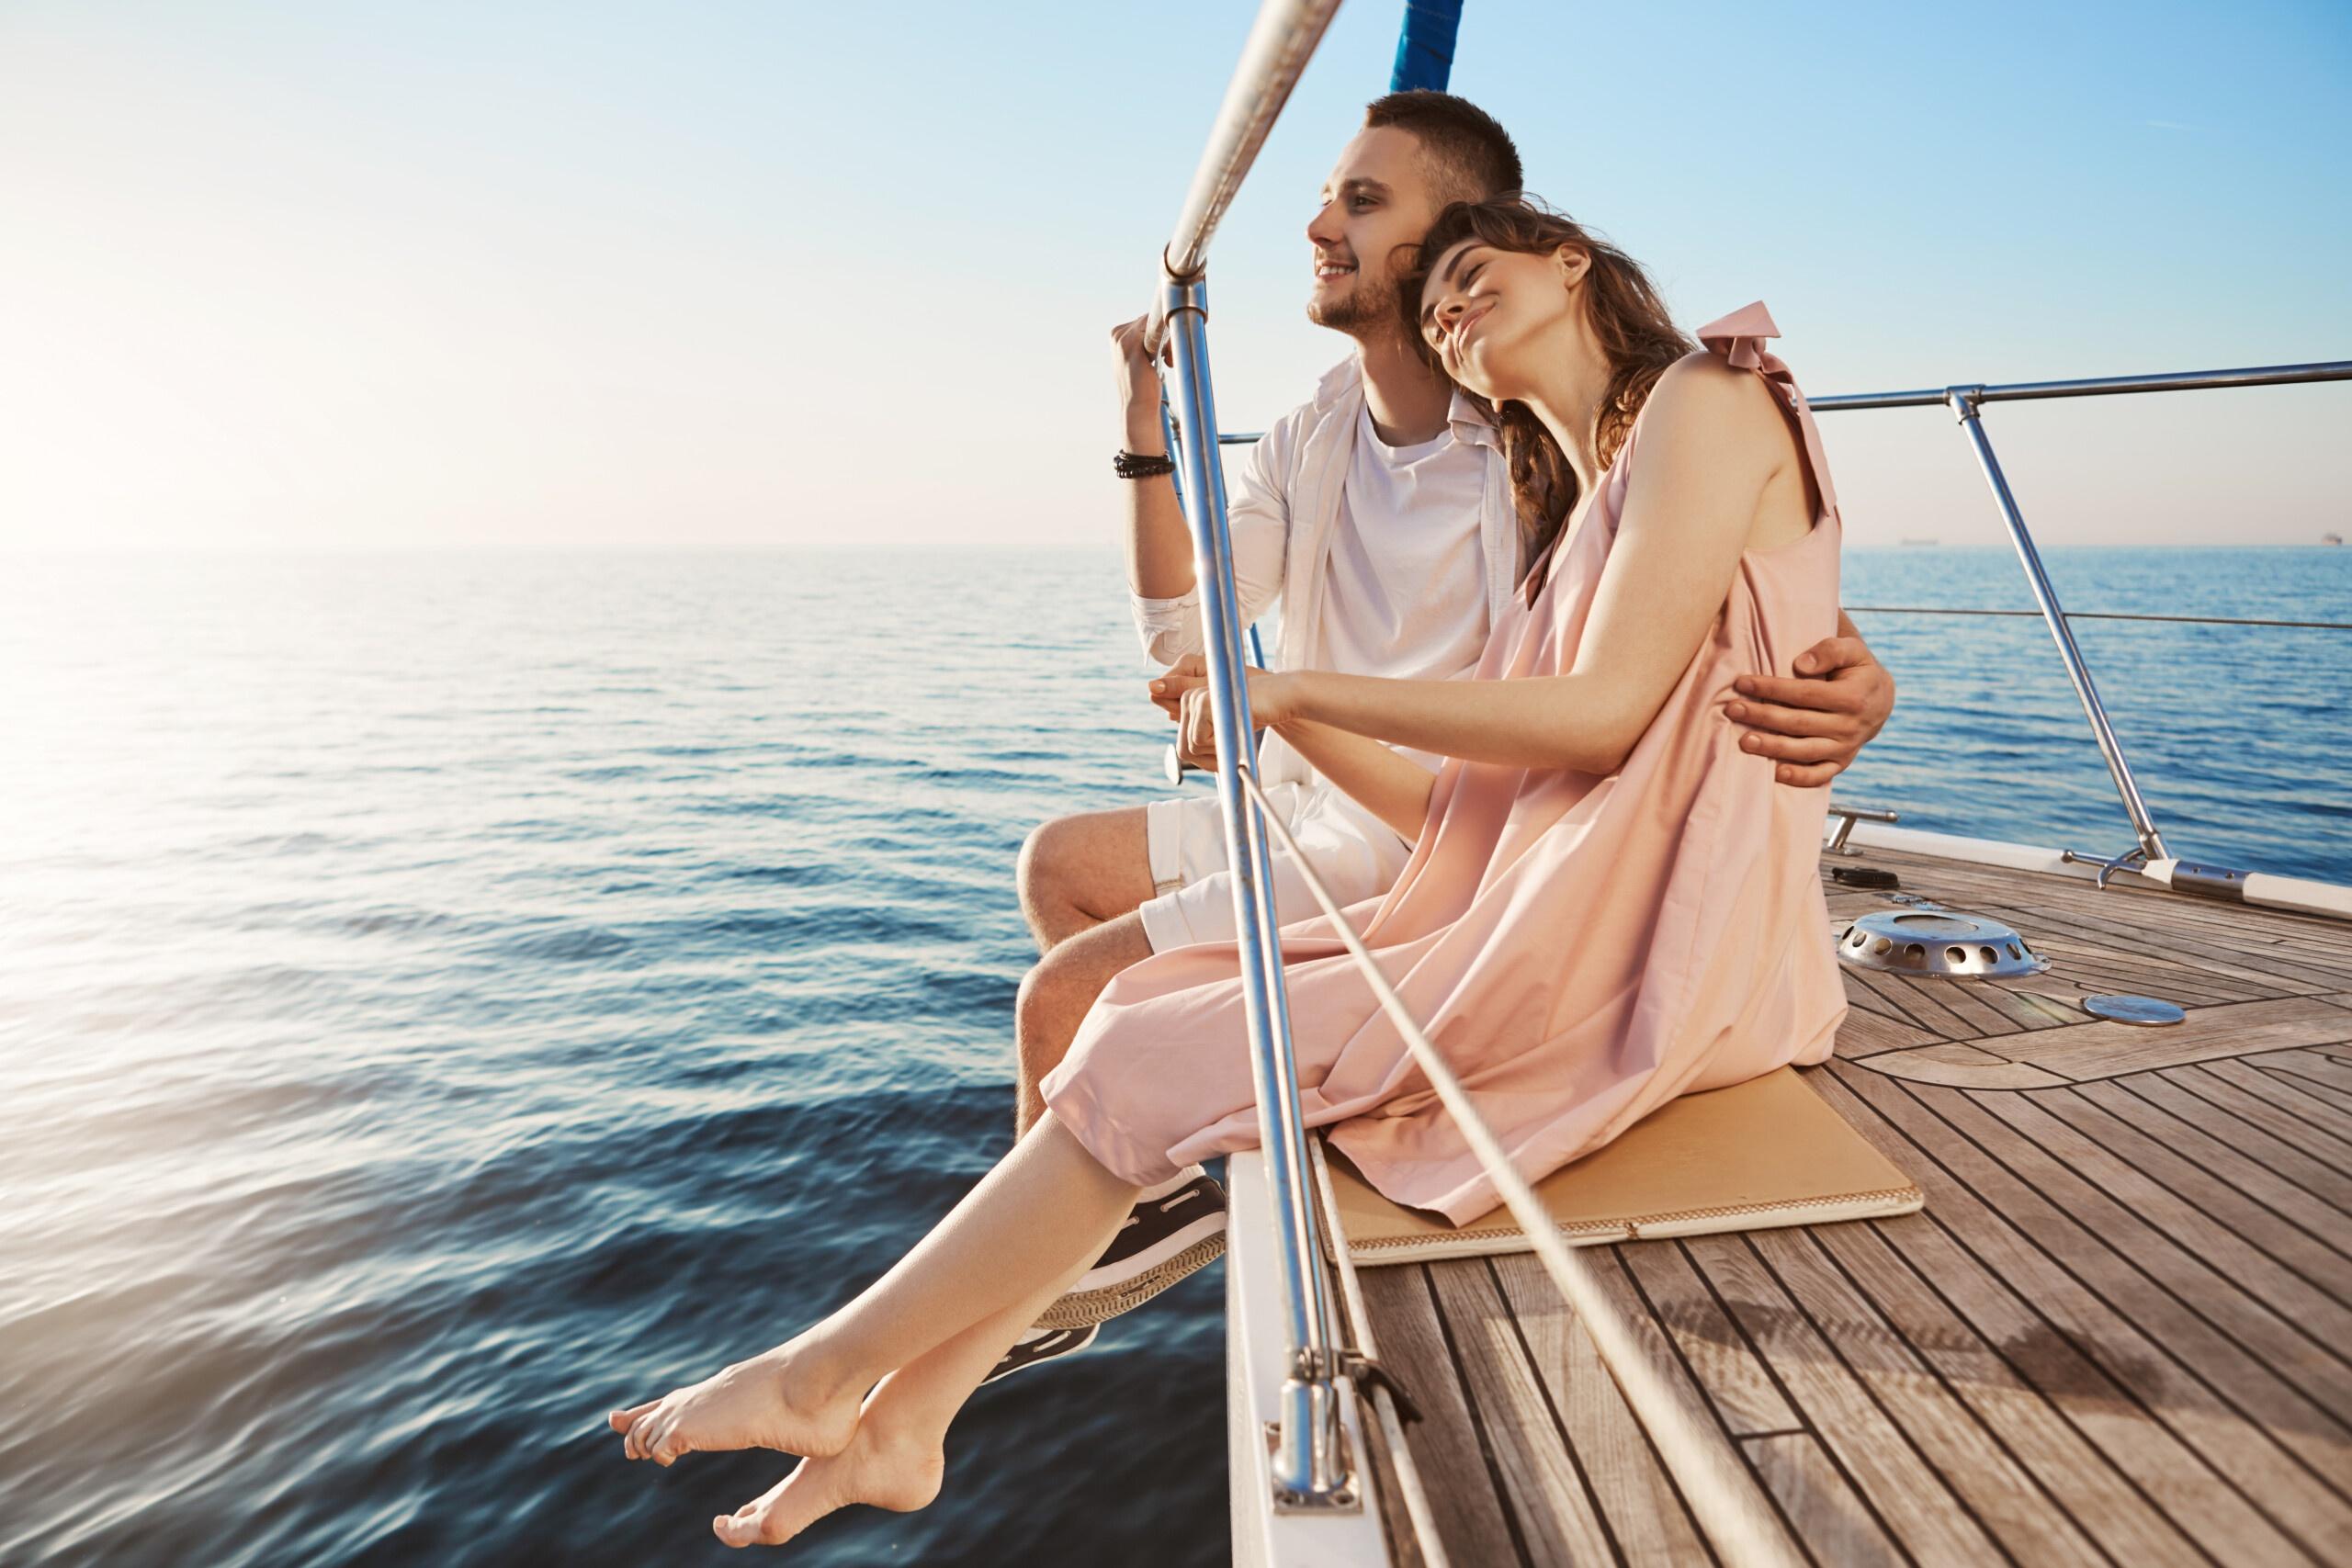 Private Yachts Rental In Dubai - yachtrentaldxb.com